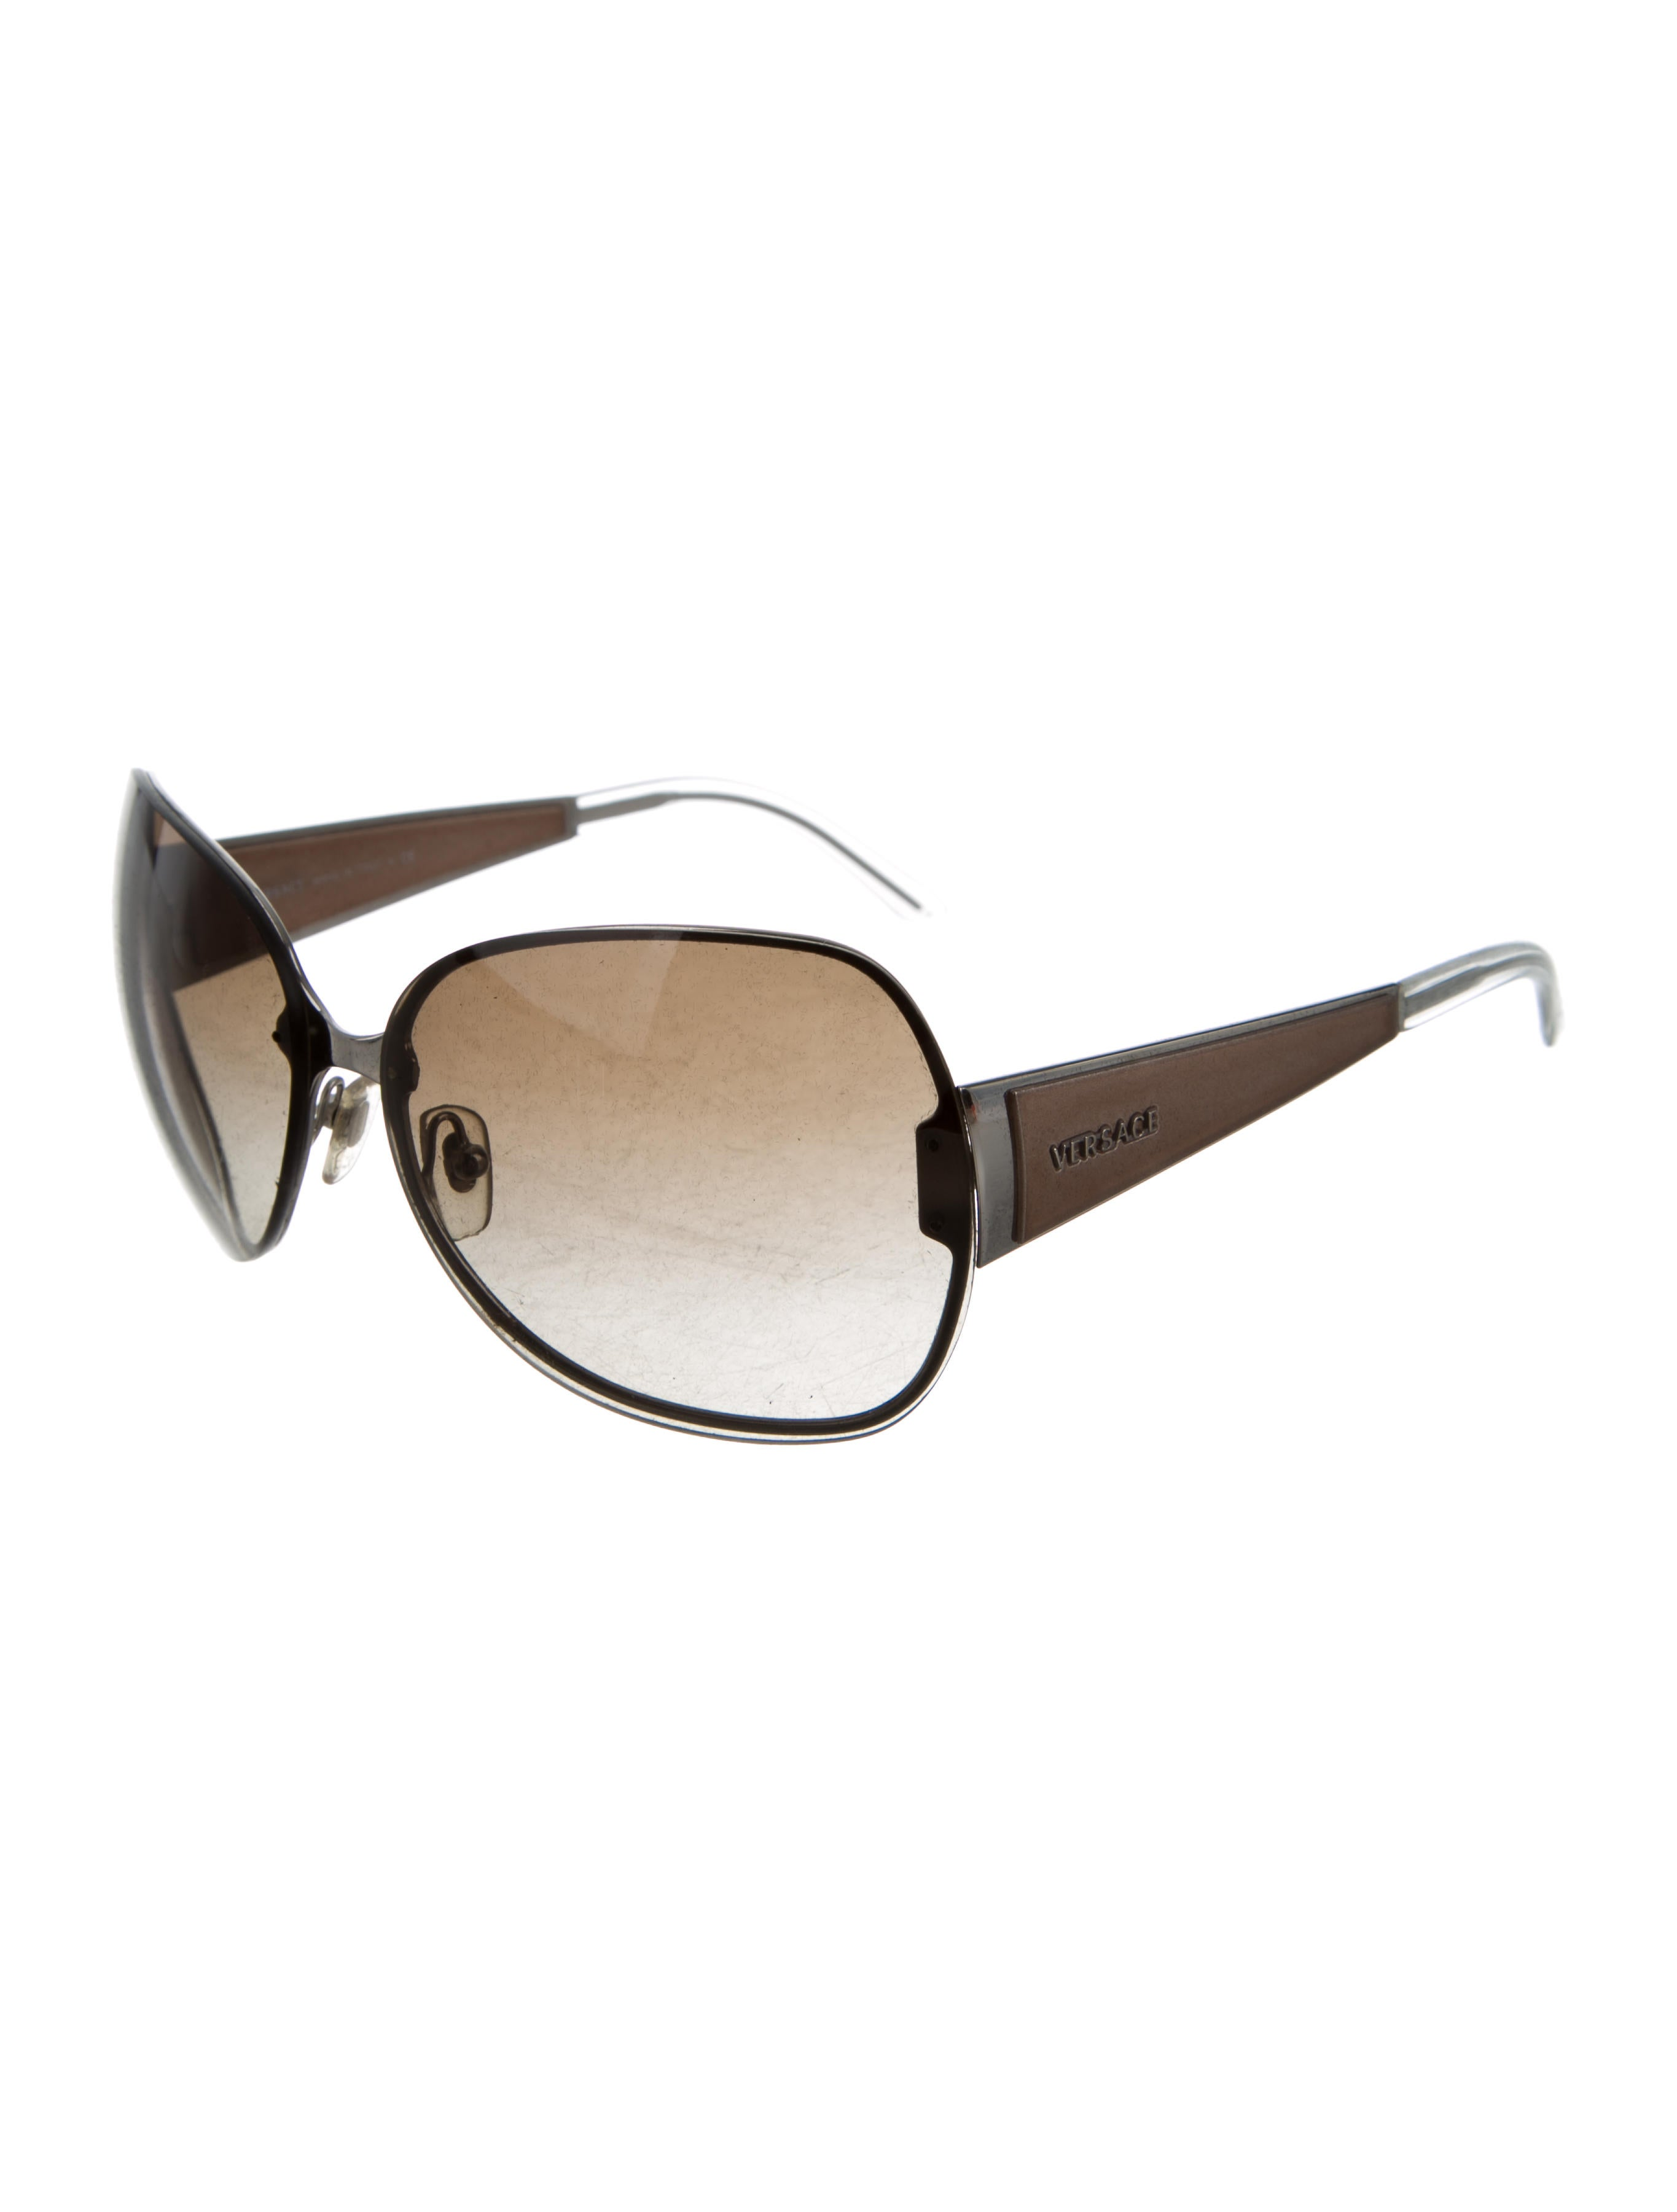 058348f7a9b5 Versace Black Rimless Sunglasses